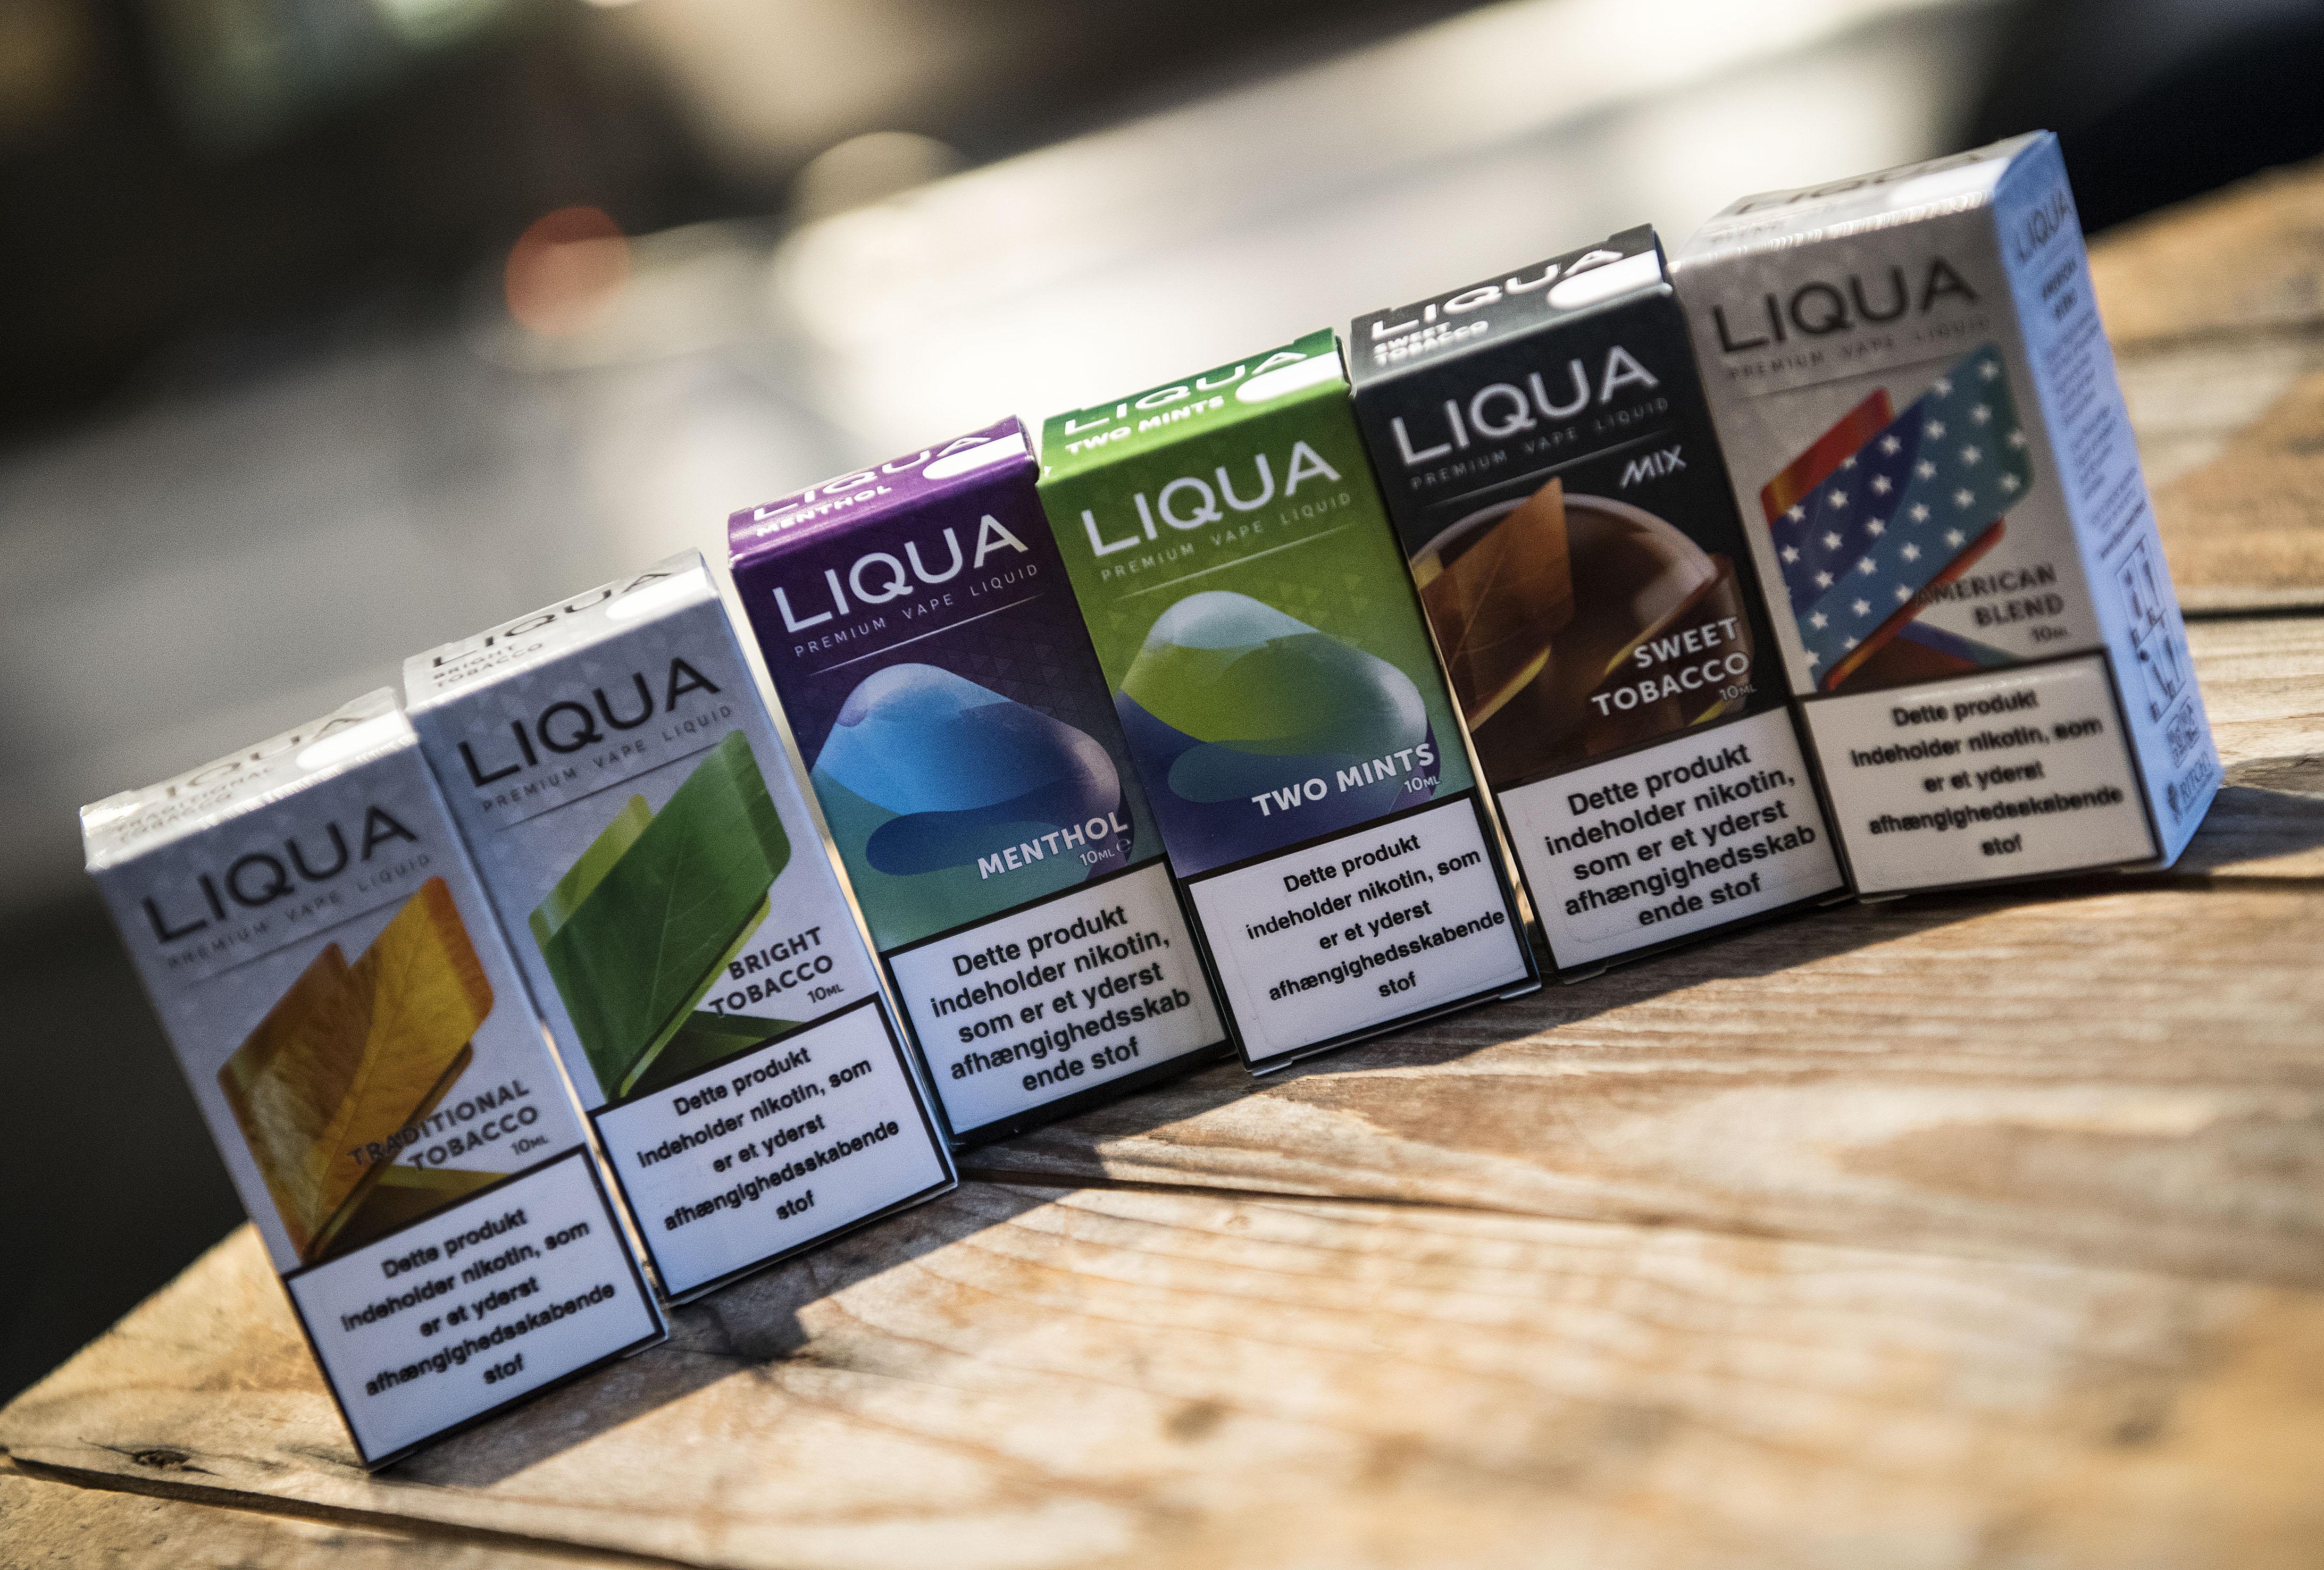 Liqua e-juice